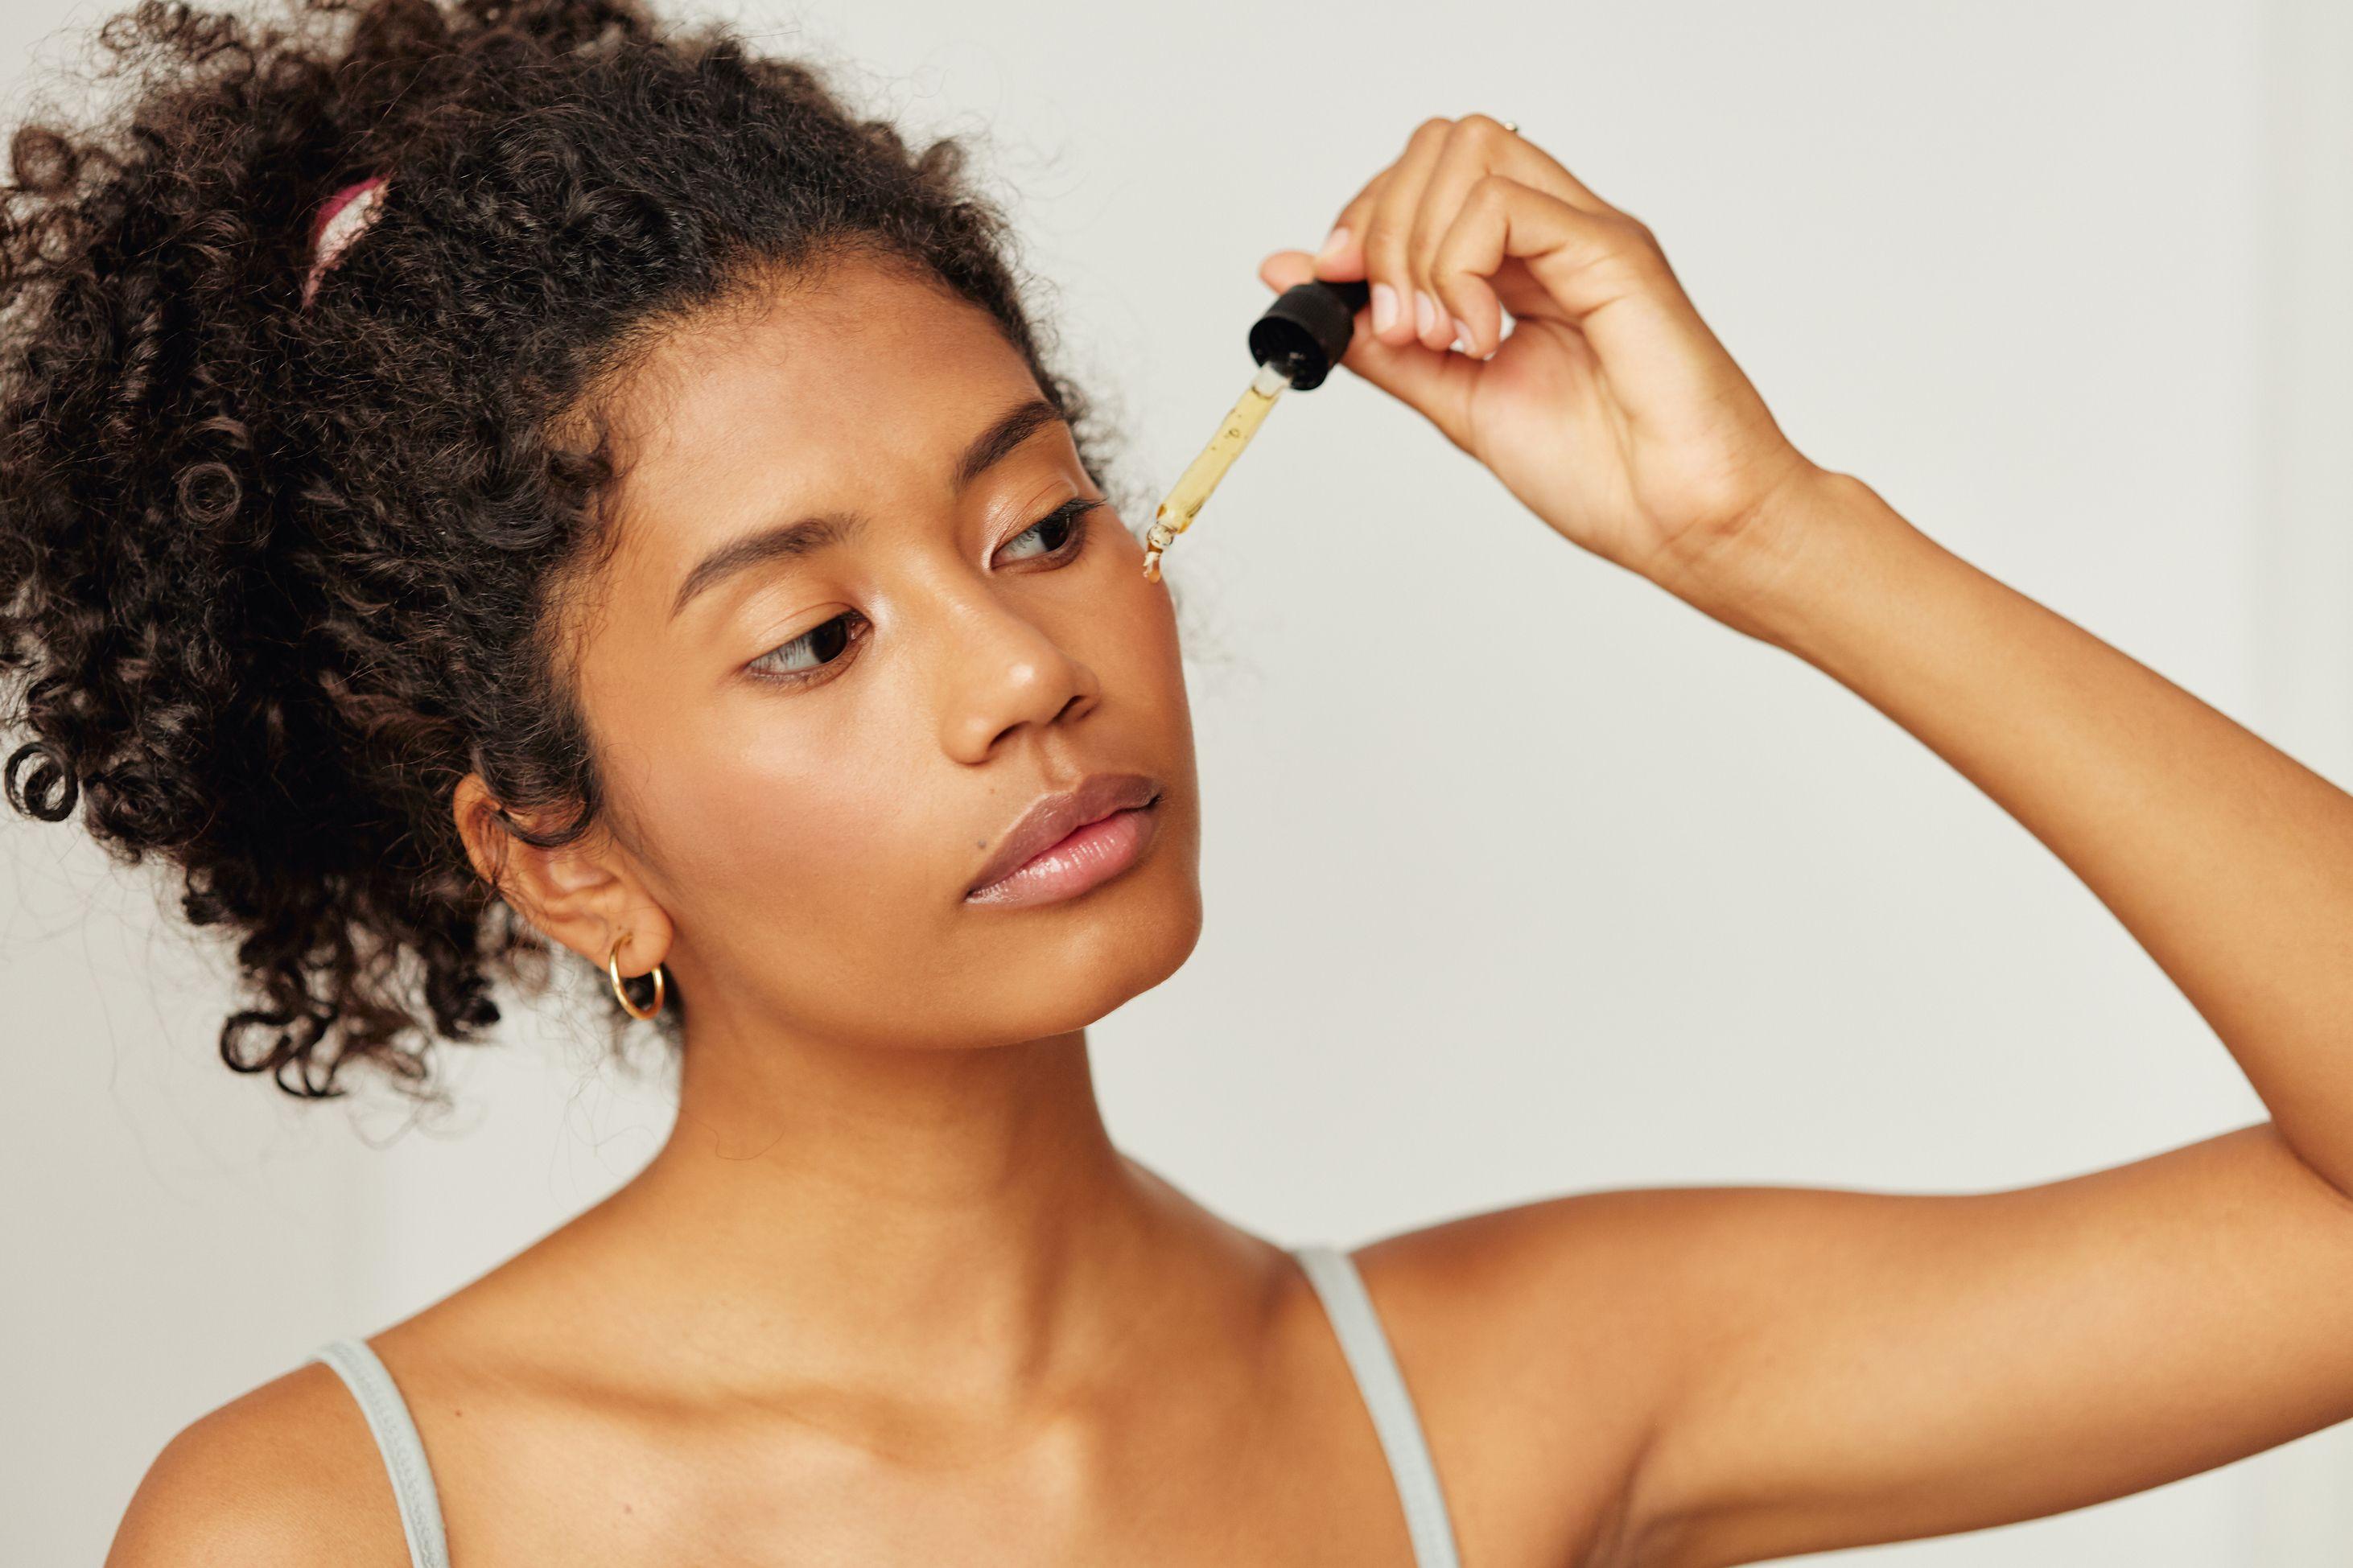 Ferulic Acid: A Dermatologist's Guide